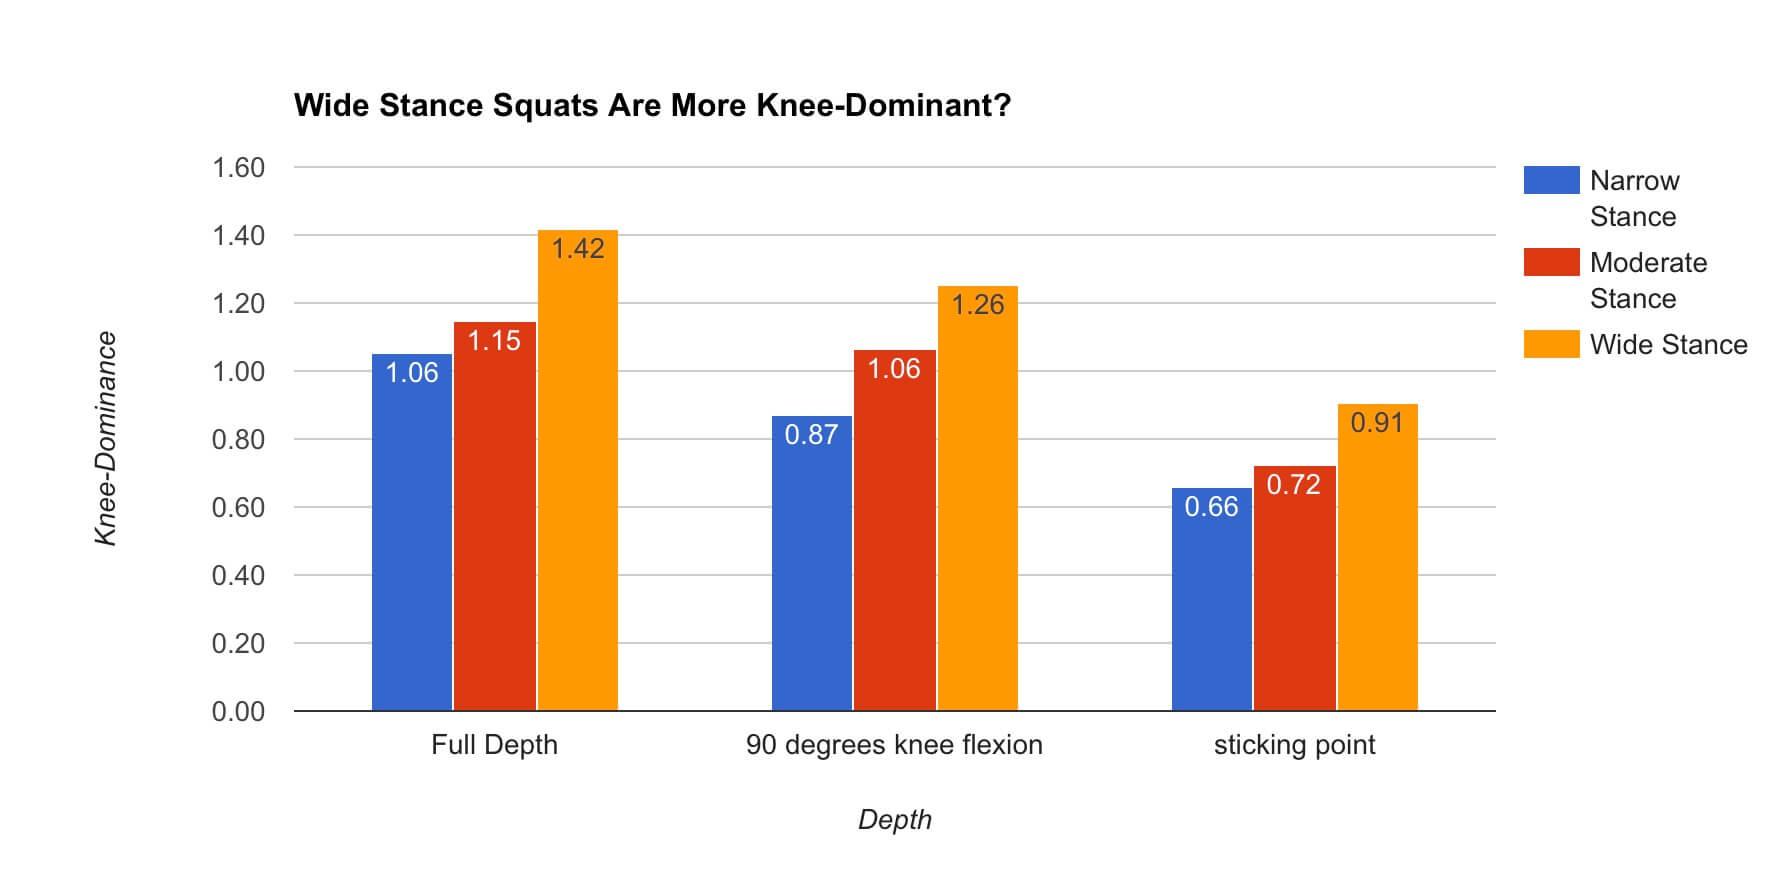 Close stance squat vs moderate stance squat vs wide stance squat knee-dominance